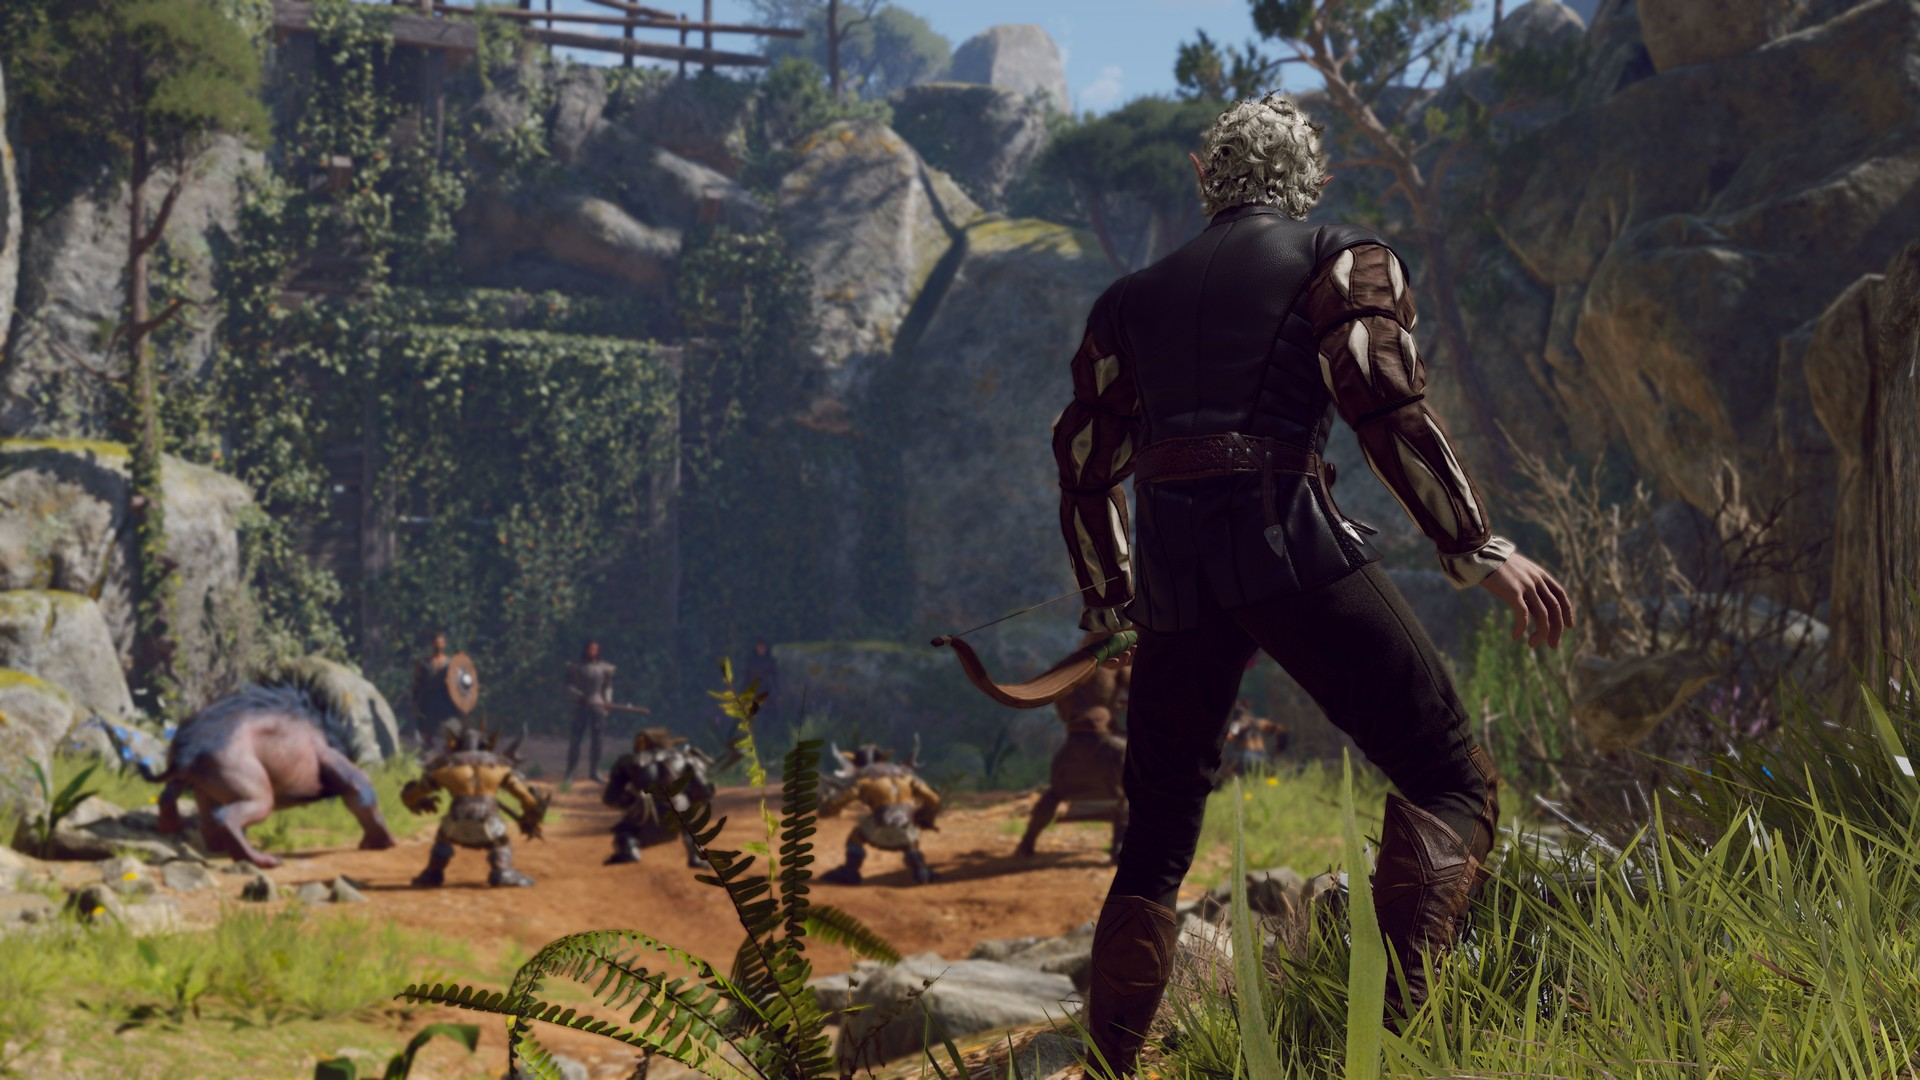 Baldurs Gate 3 gameplay trailer